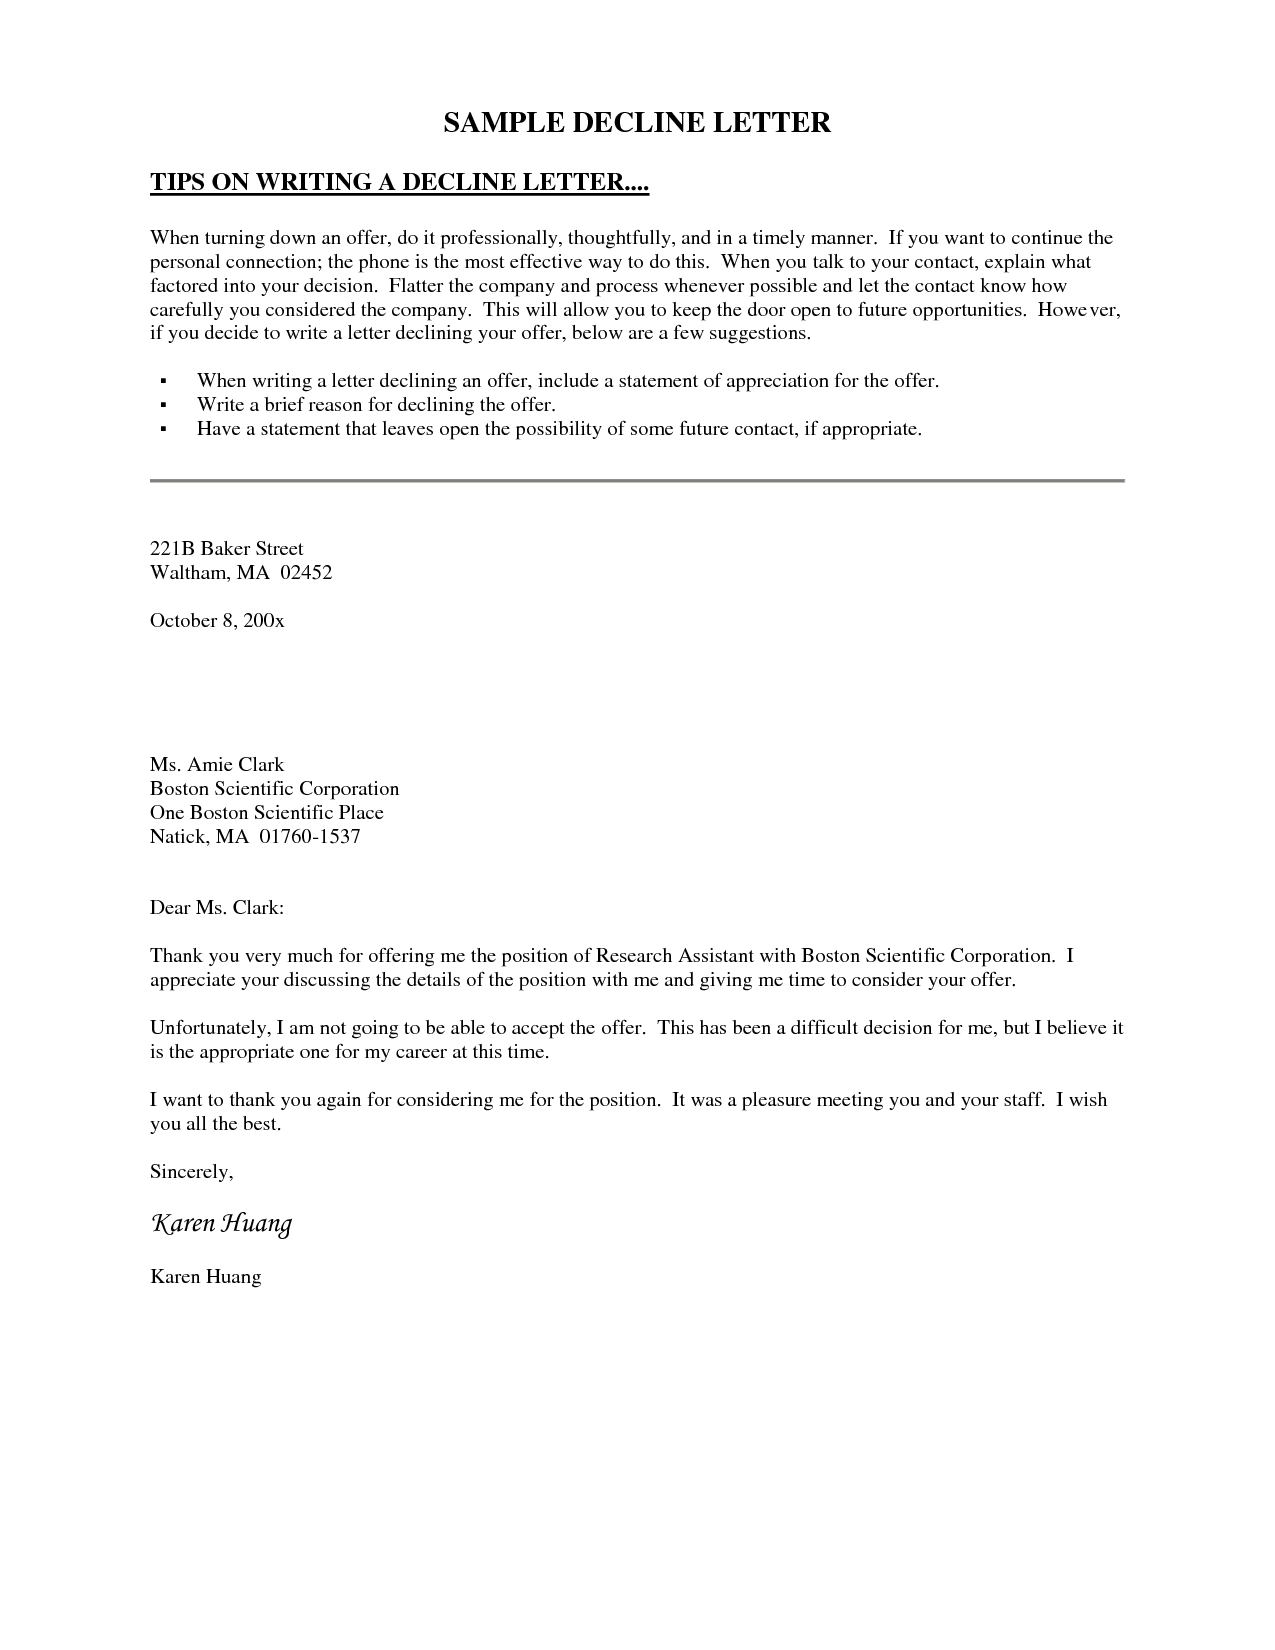 consent for non-government school applicants